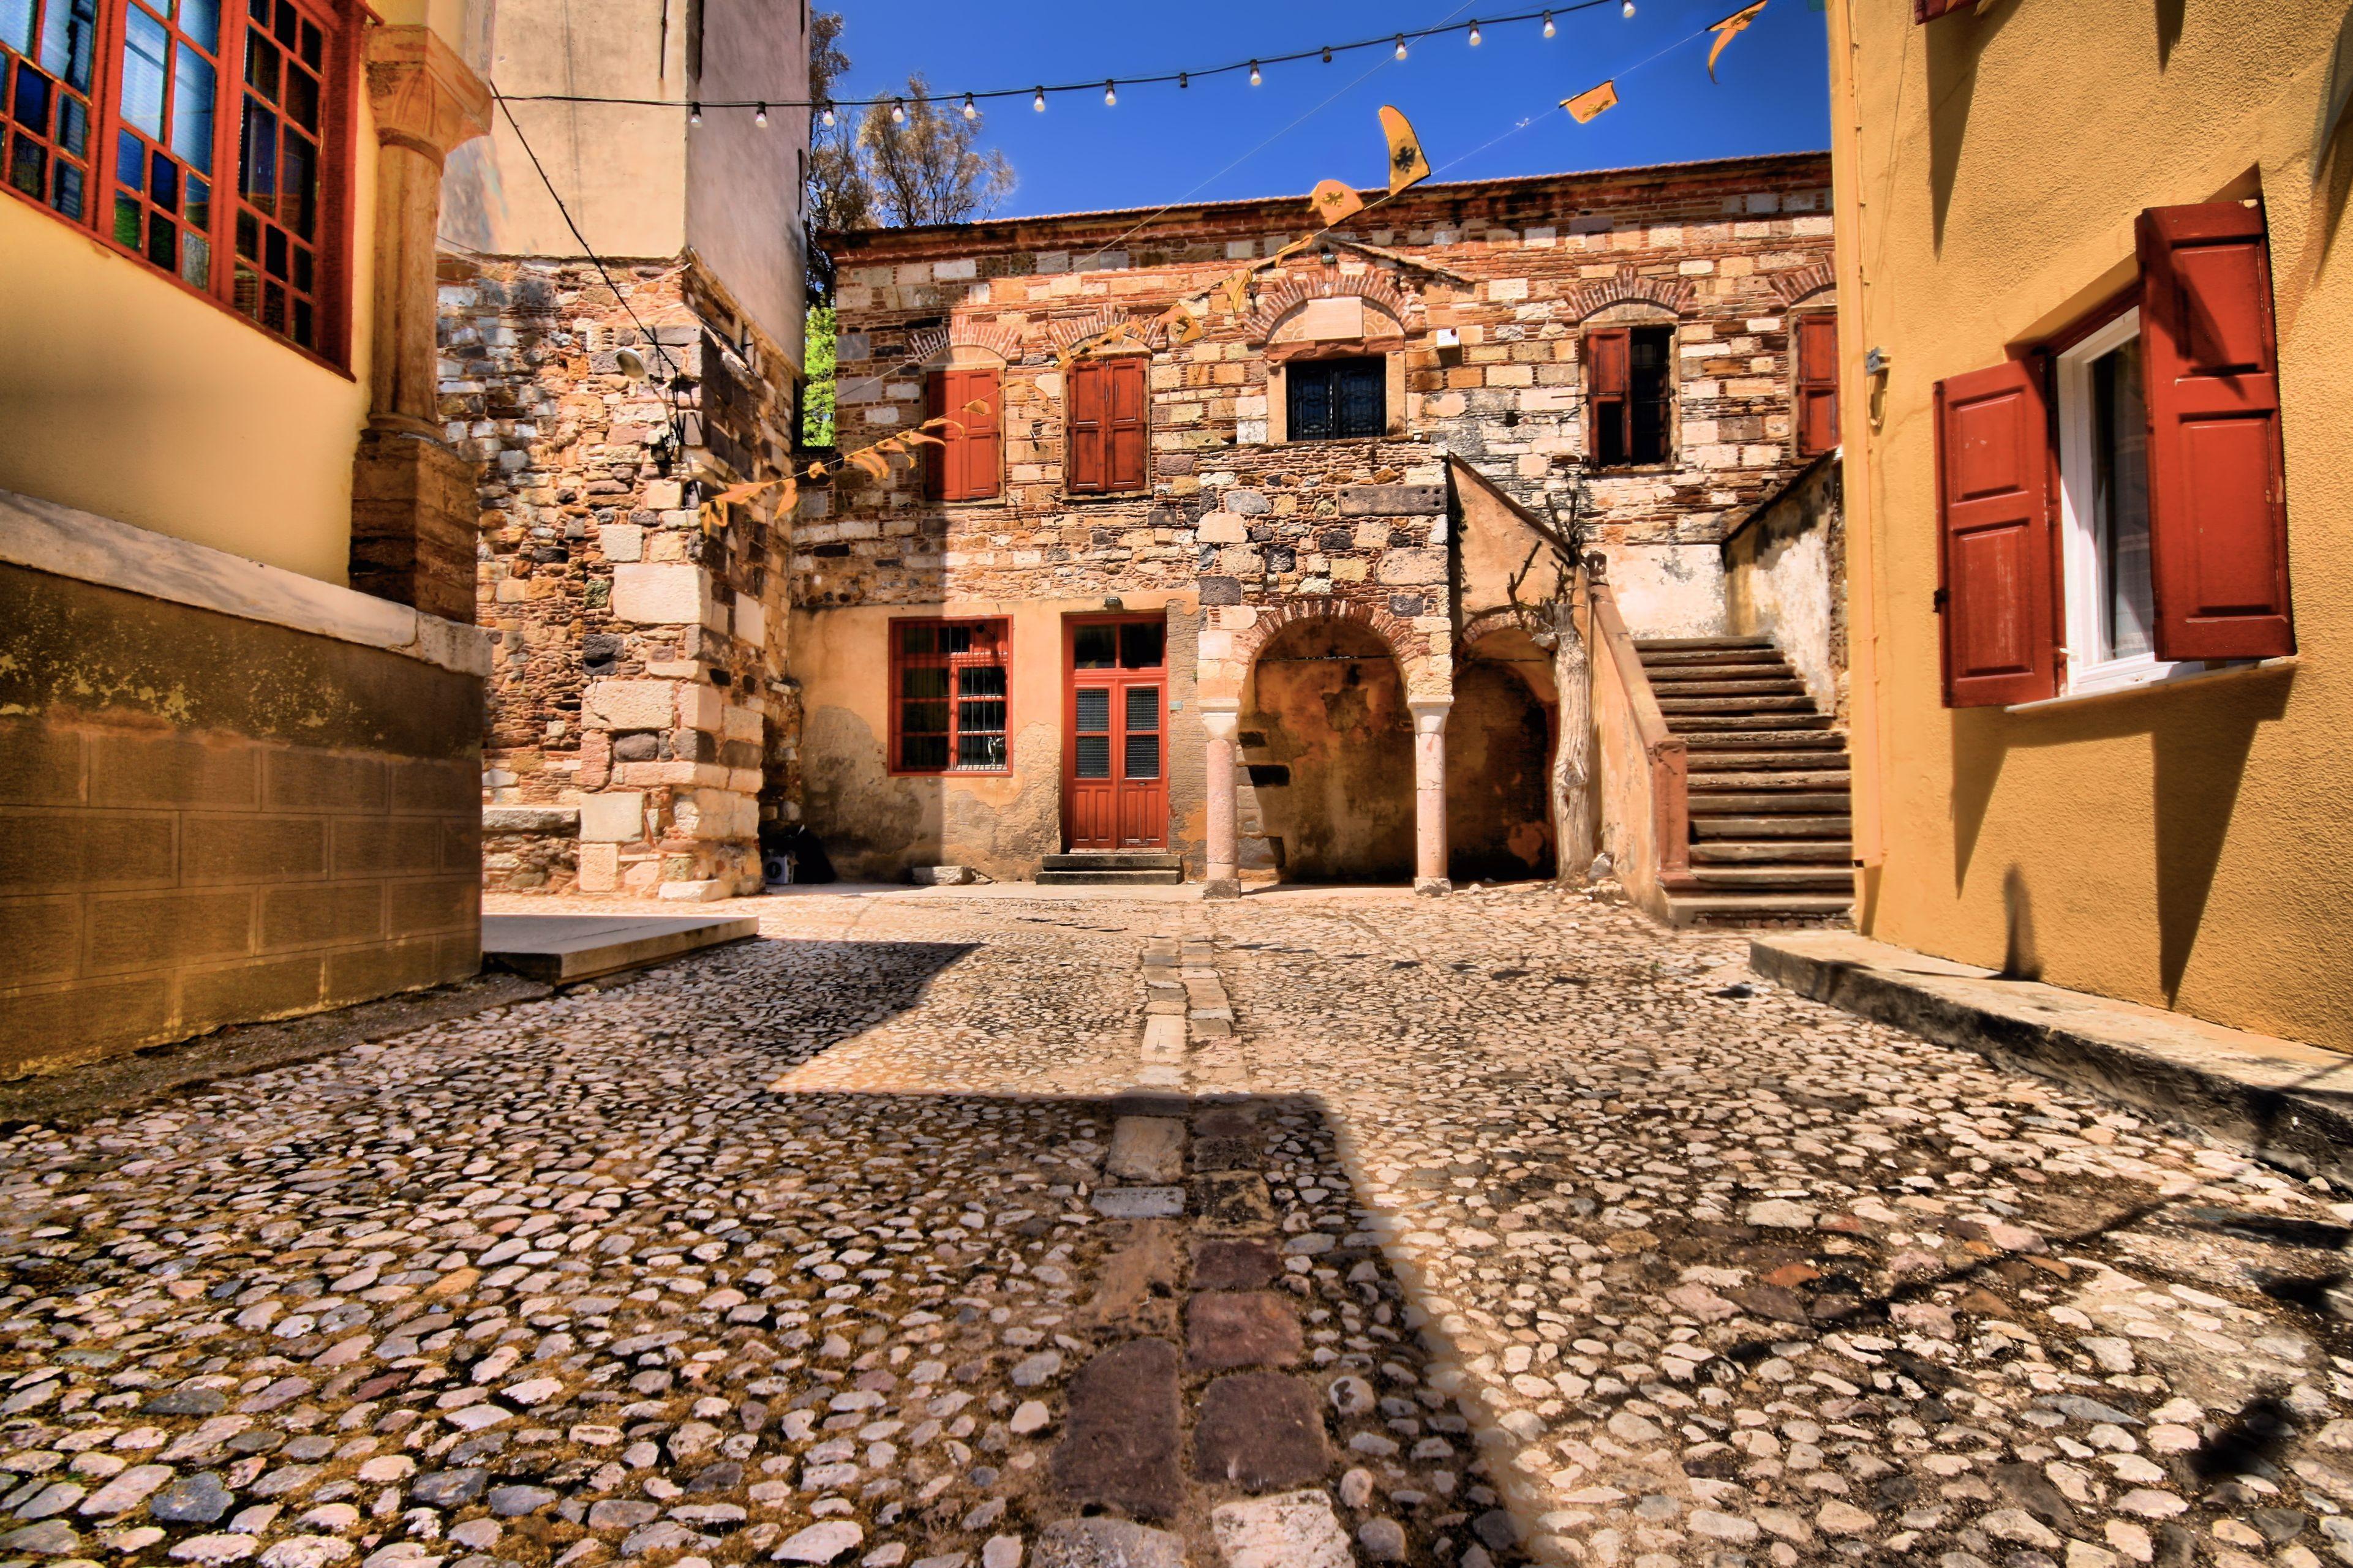 городские дворики картинки вейбул